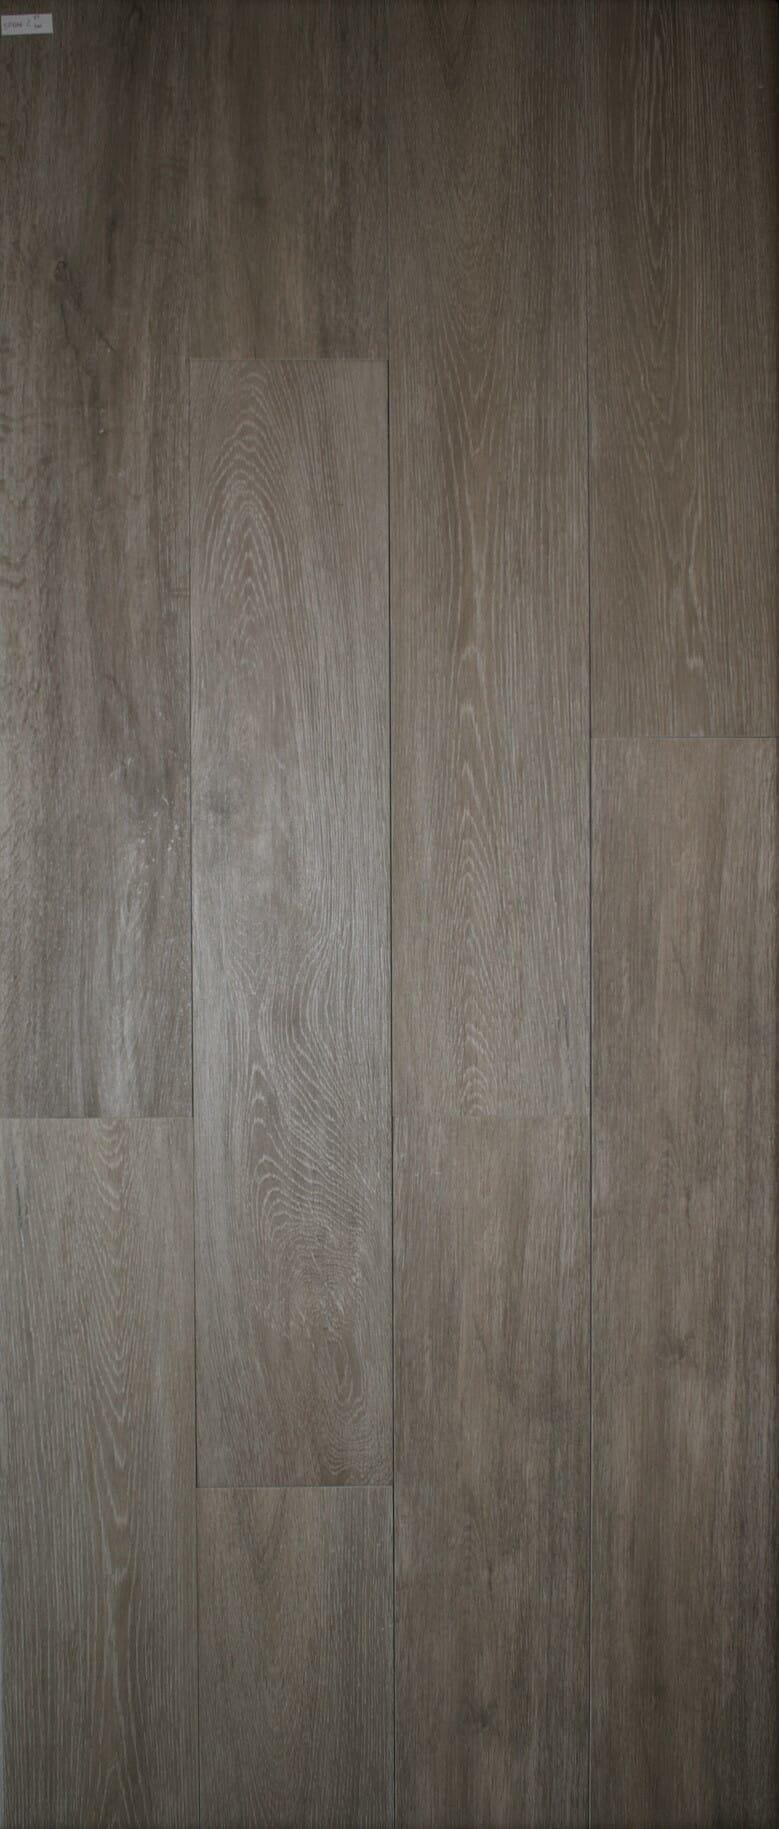 Wood Look Tile Canada Chestnut Tiles Amp Stone Warehouse